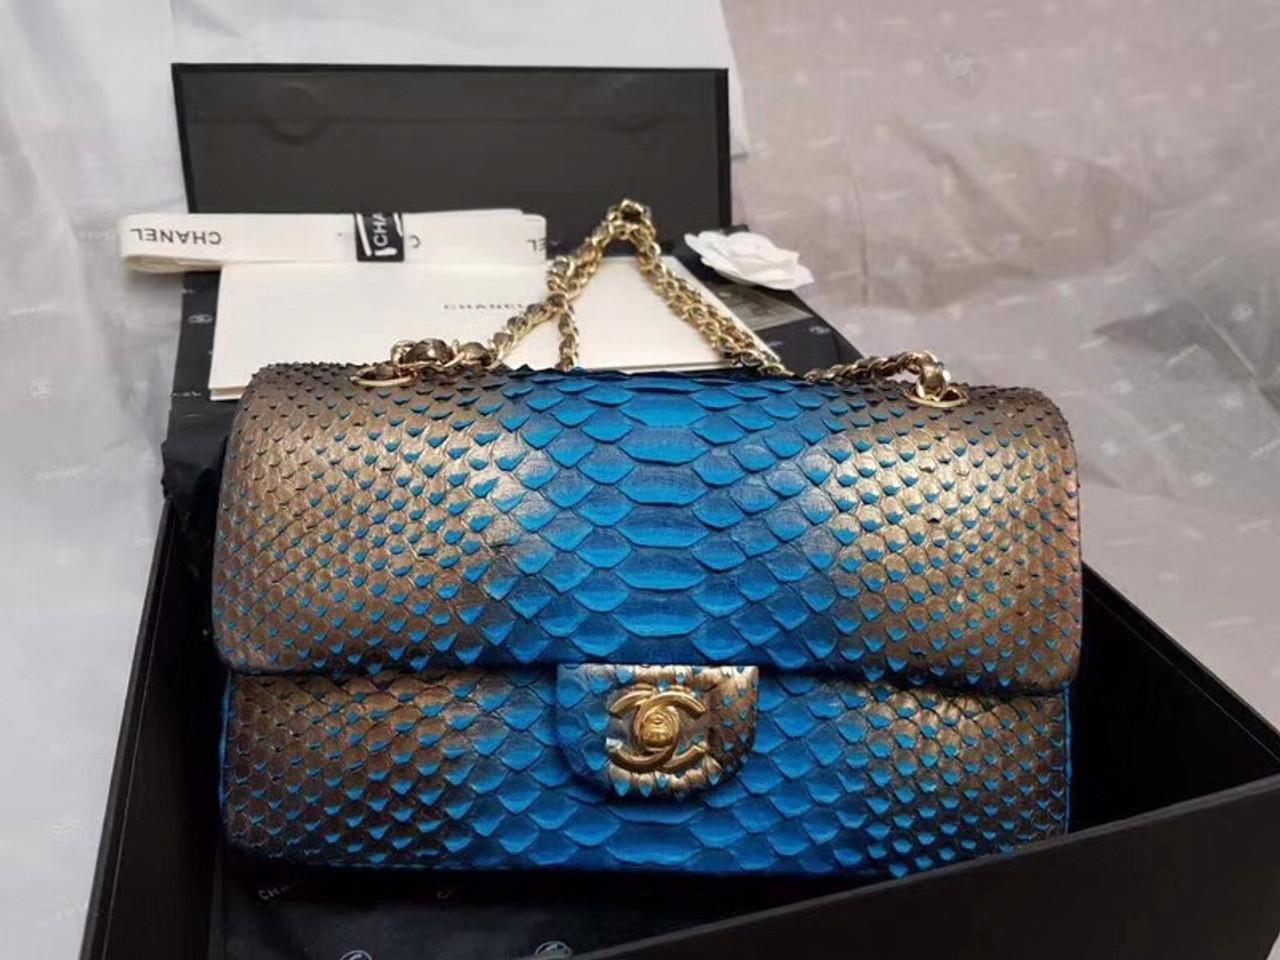 8513e1d077bc CHANEL 2.55 Python Handbag Dubai Limited Edition - Bella Vita Moda